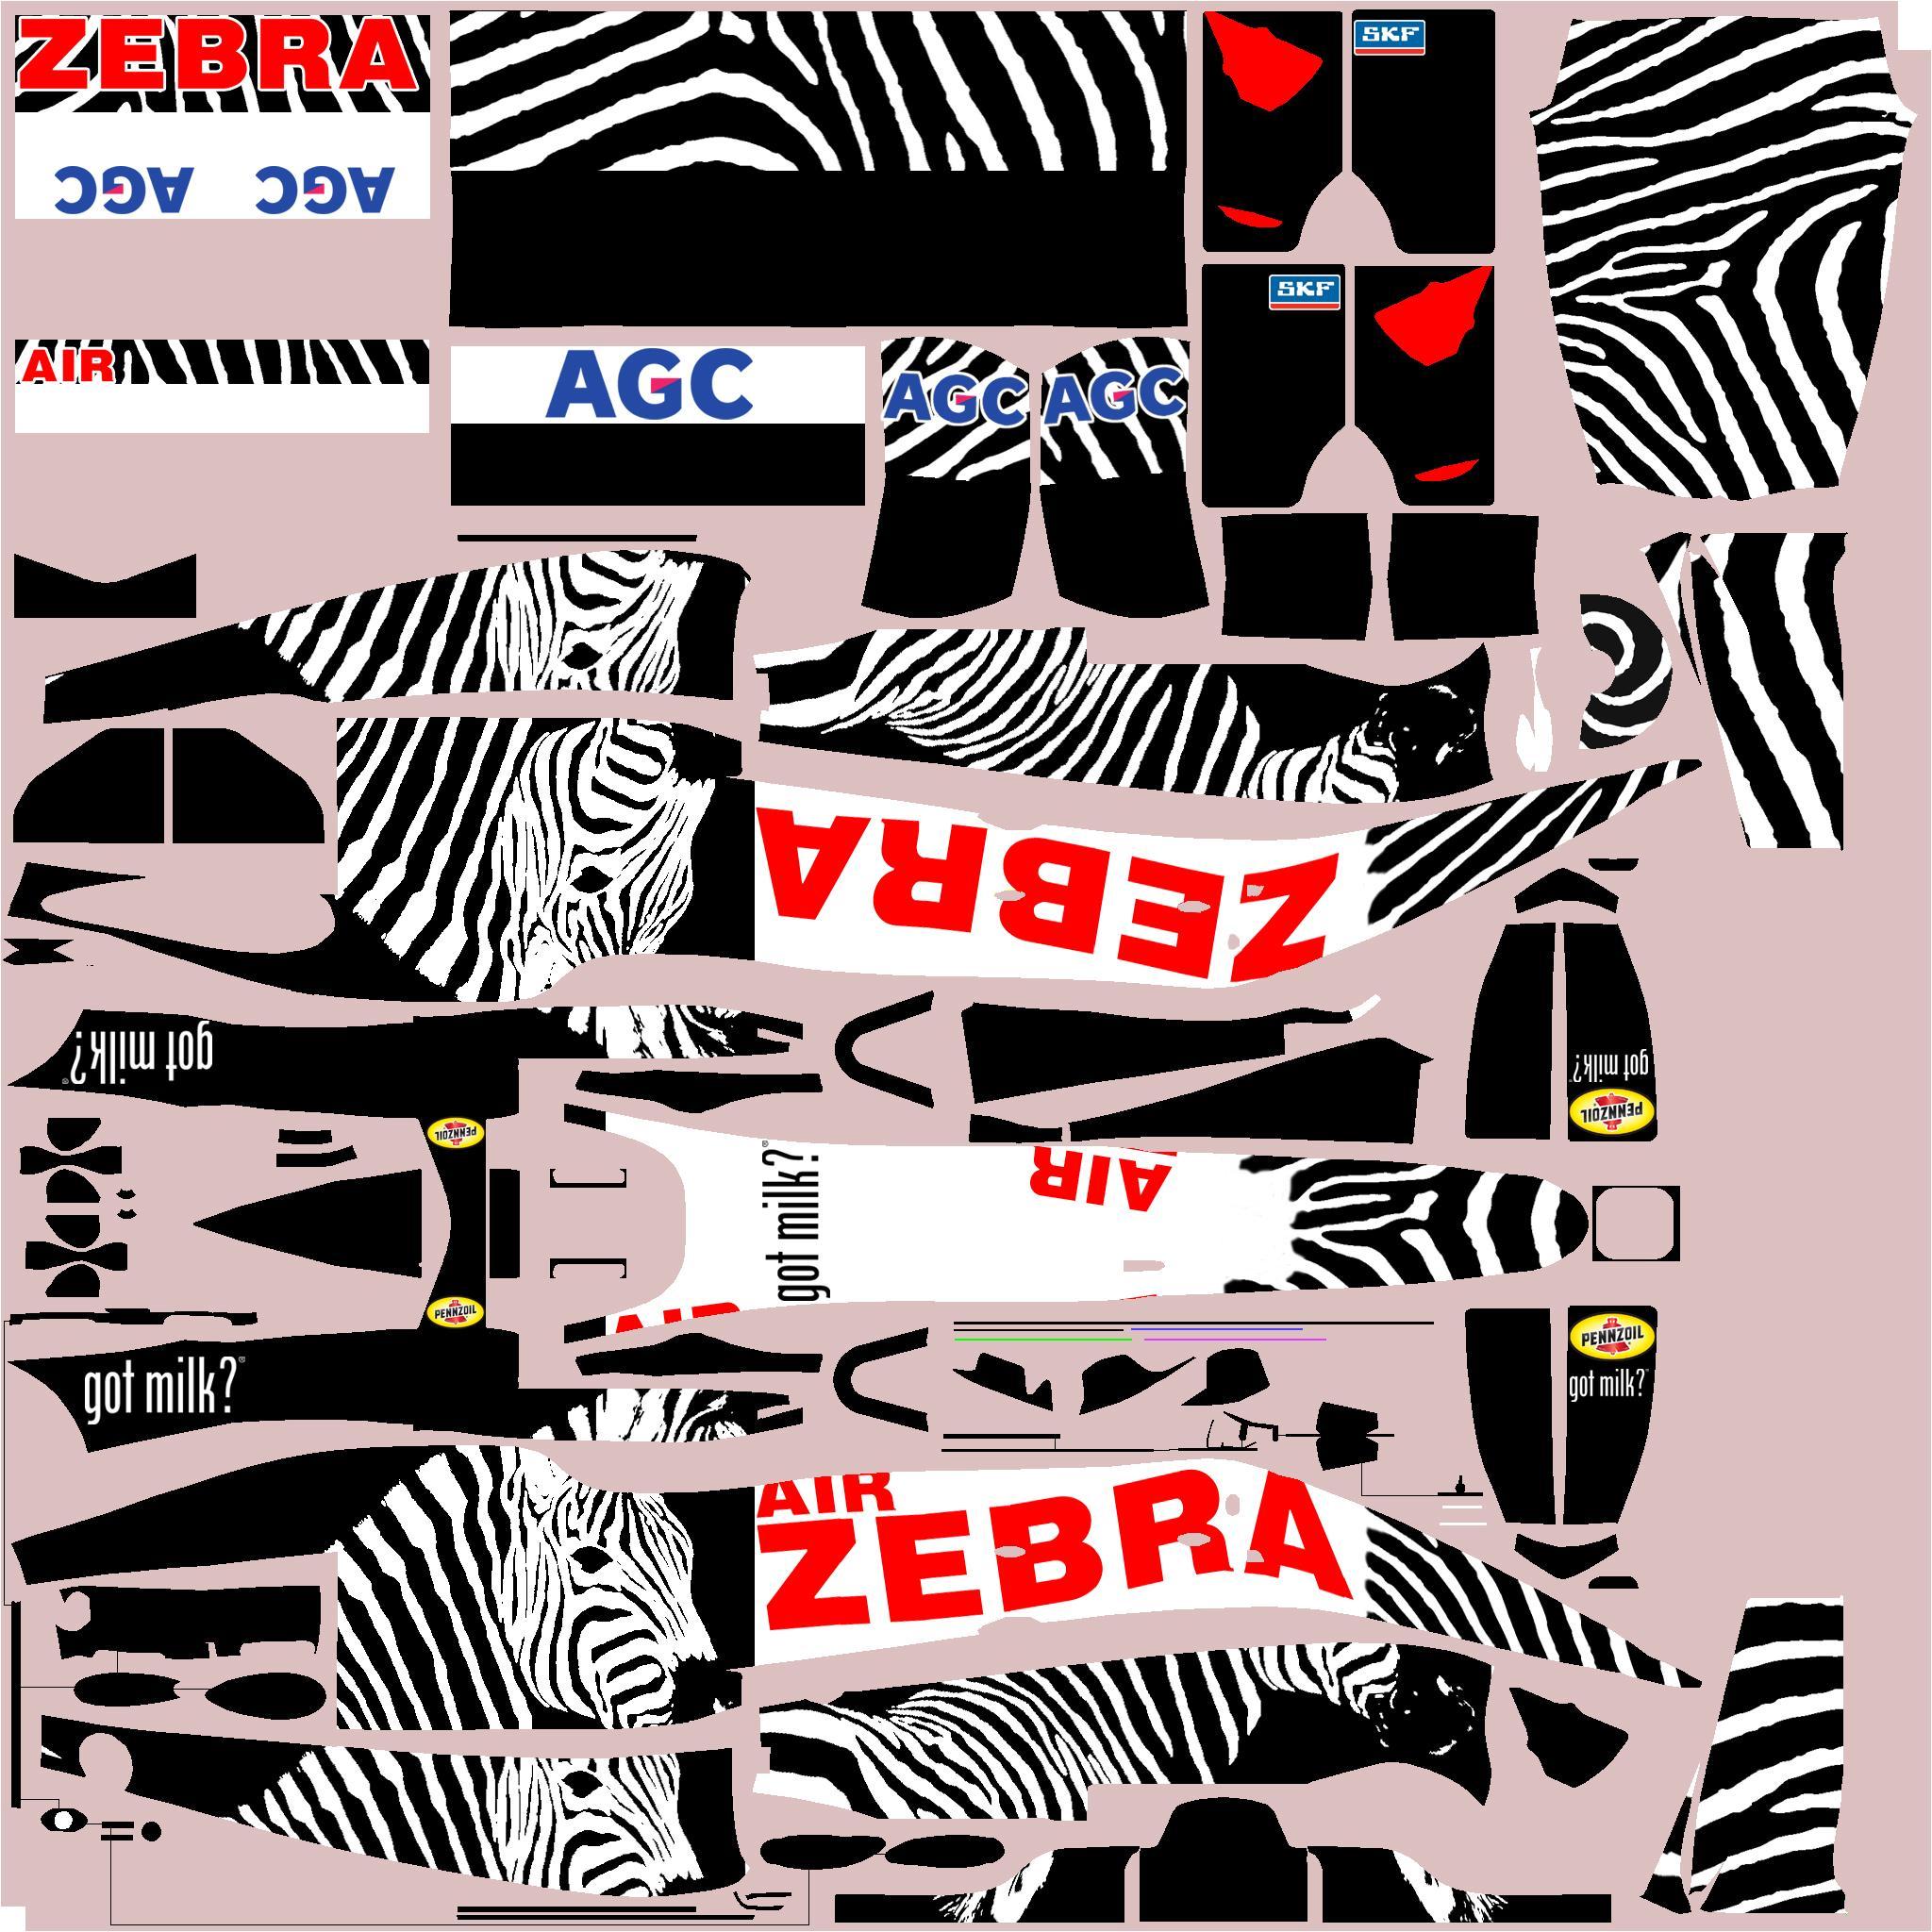 Preview of Dallara F3 Zebra Air by Clyde Coman